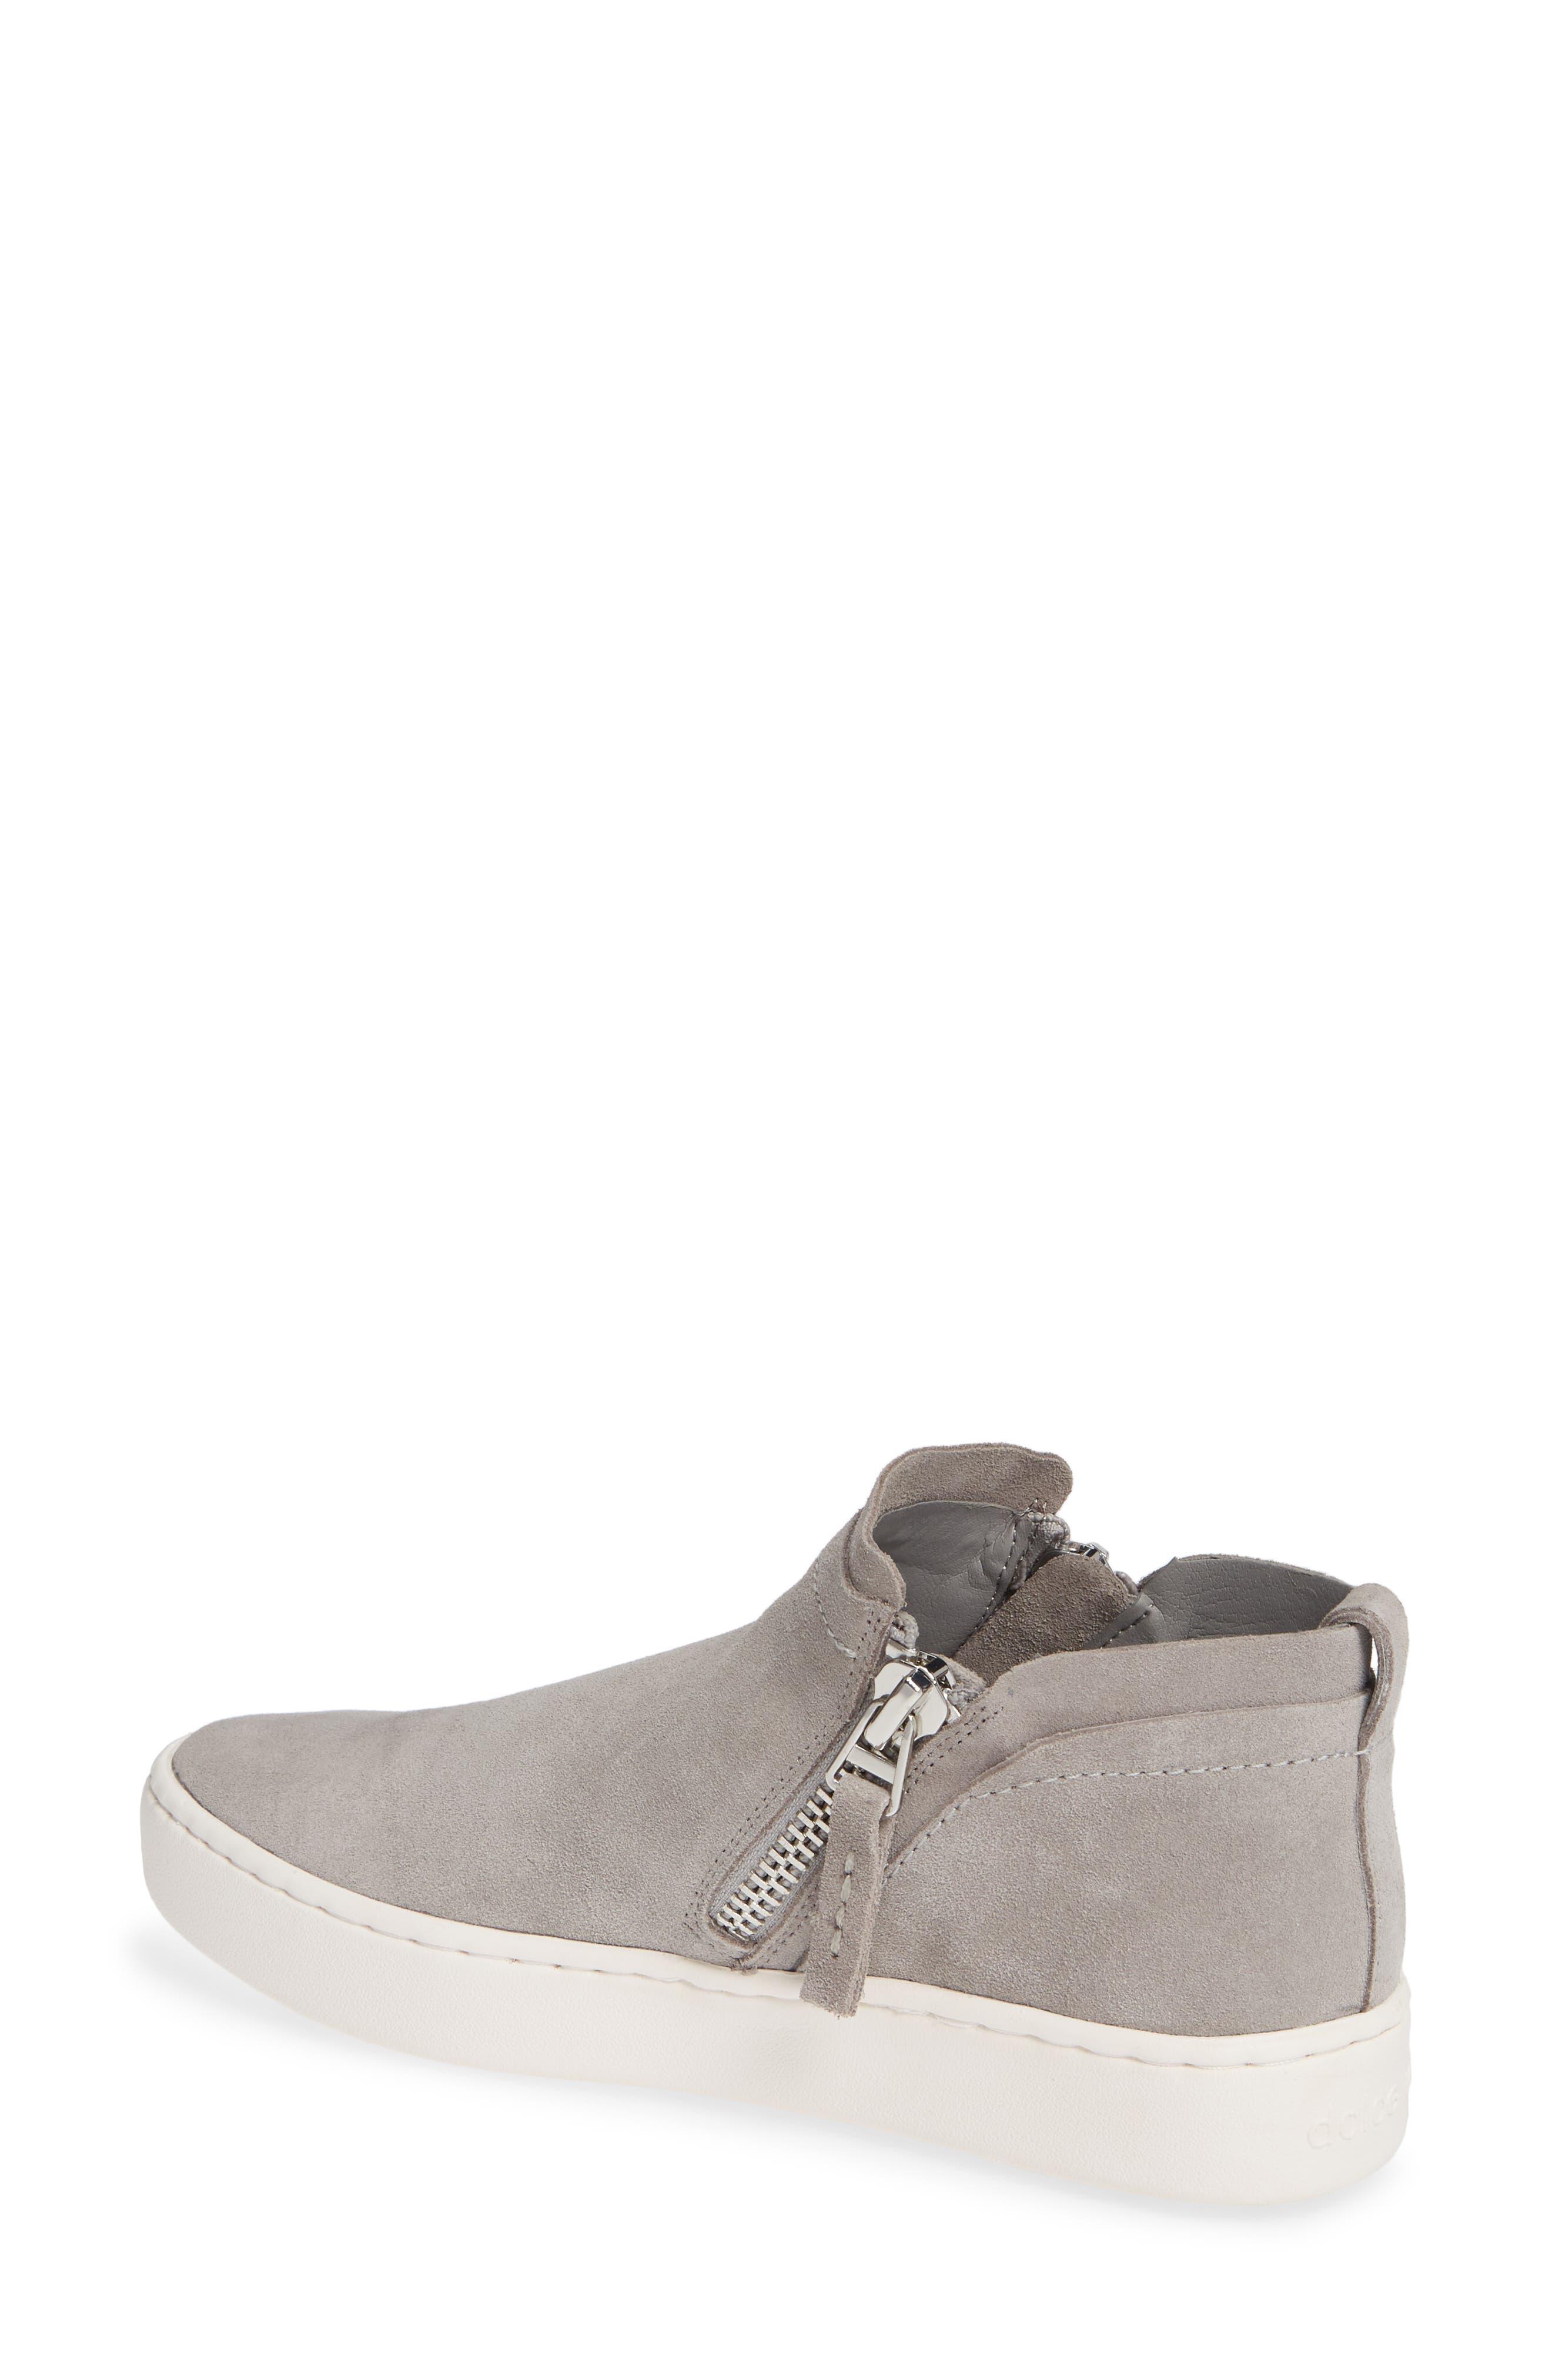 DOLCE VITA,                             Tobee Zip Sneaker,                             Alternate thumbnail 2, color,                             SMOKE SUEDE